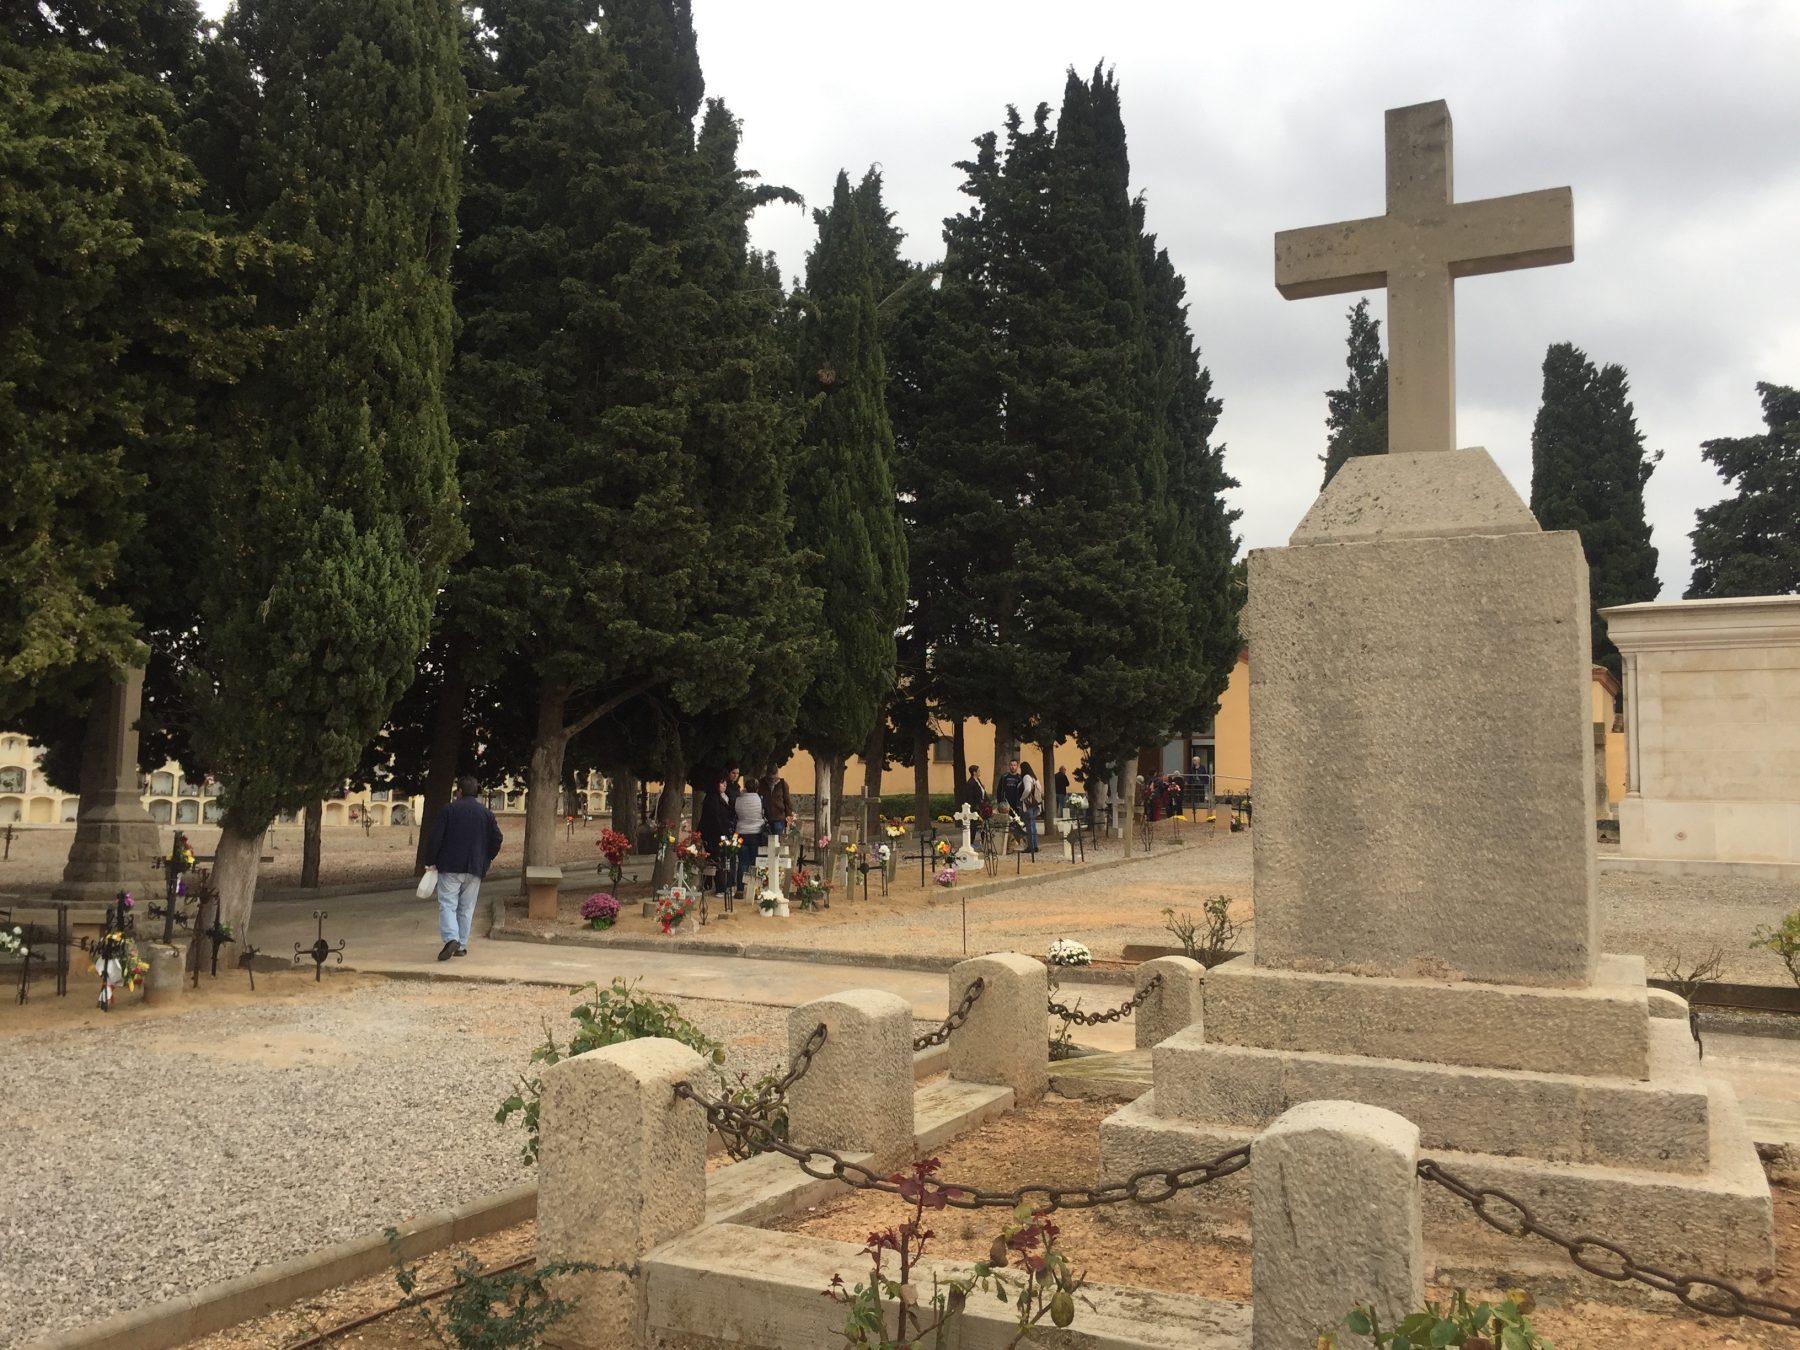 El cementiri de l'Espluga, durant la Diada de Tots Sants. (Foto: Xavier Lozano)